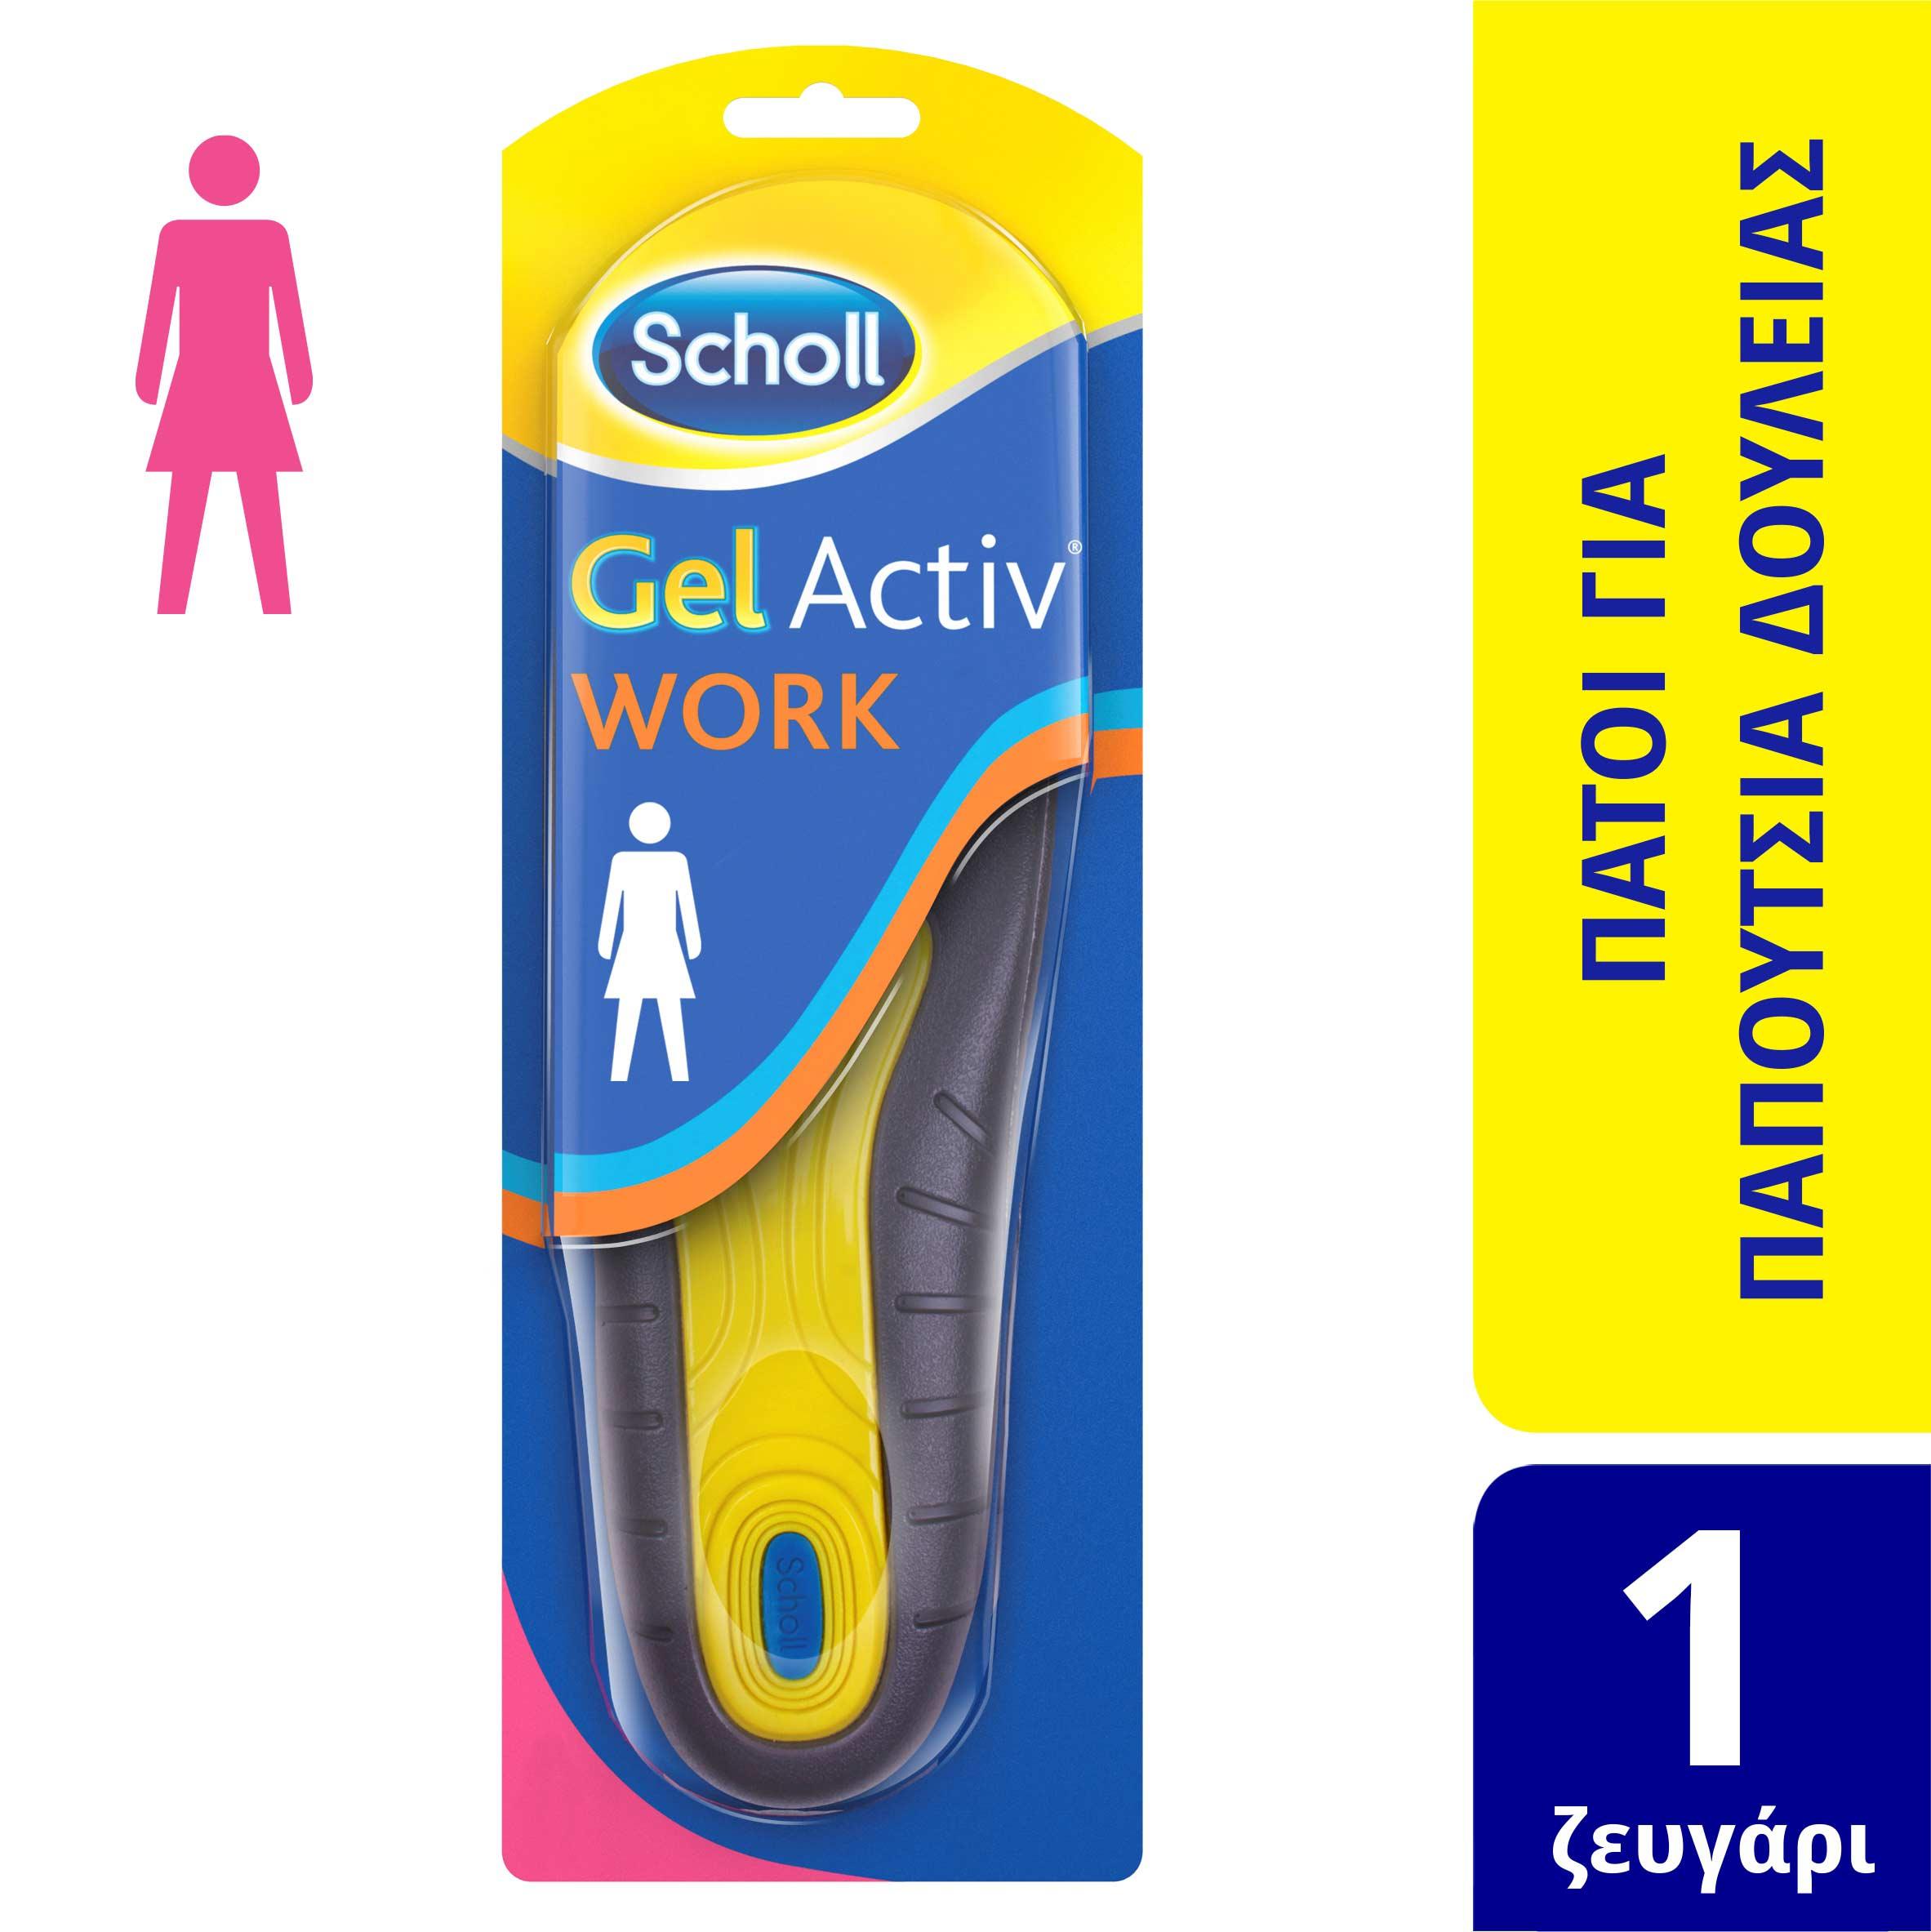 Scholl Gel Activ Work Ανατομικοί Πάτοι Γυναικείοι για Άνεση στα «Σκληρά Εργαζόμενα Πόδια», 2 τεμάχια